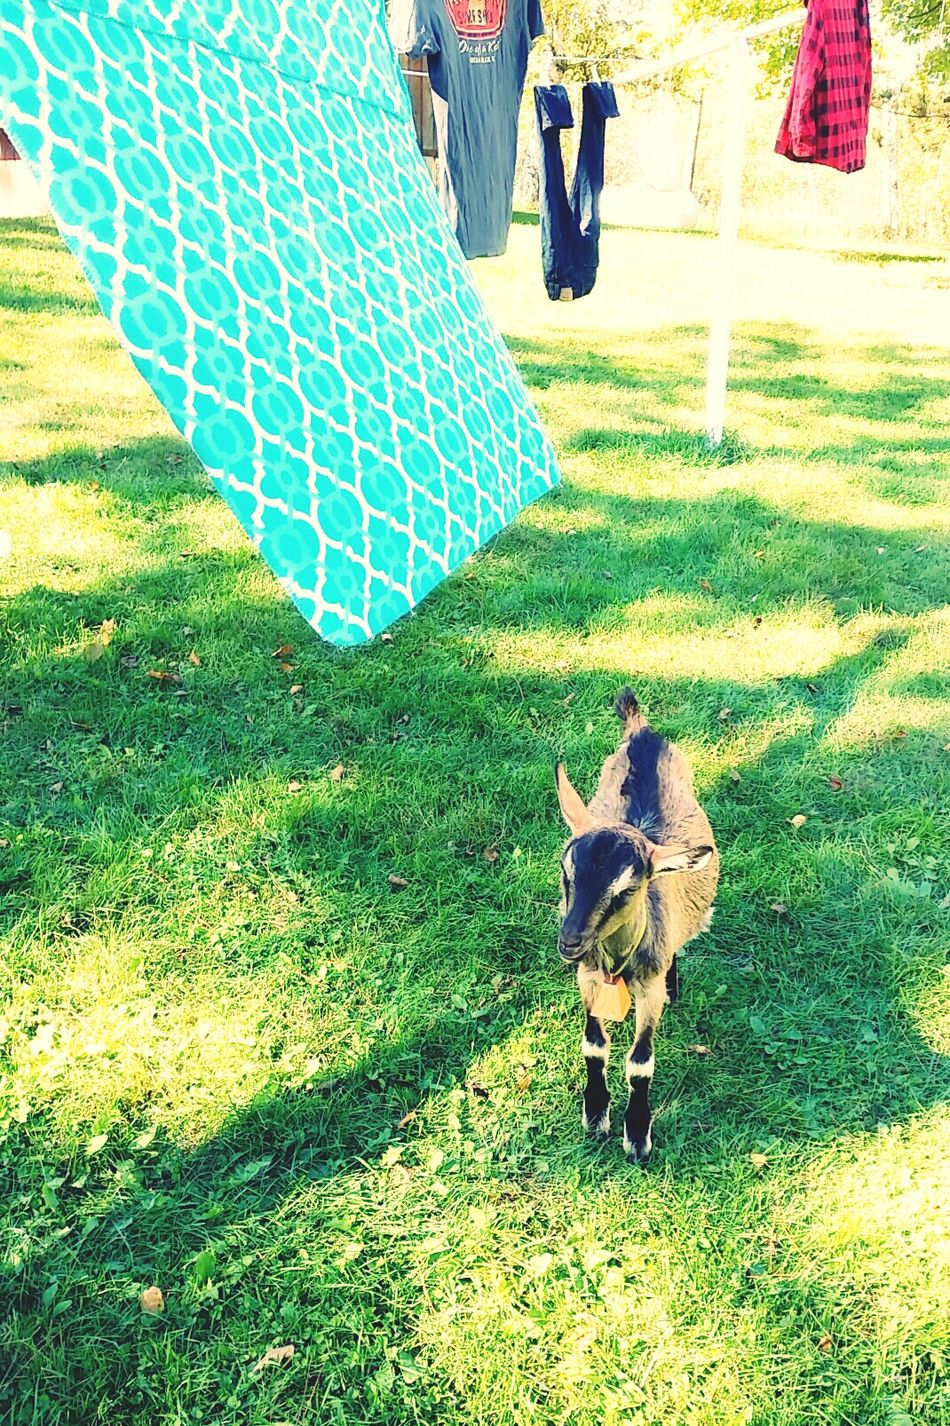 Capture The Moment Pet Photography  Milo & Me Enjoying Life Goats Baby Goat